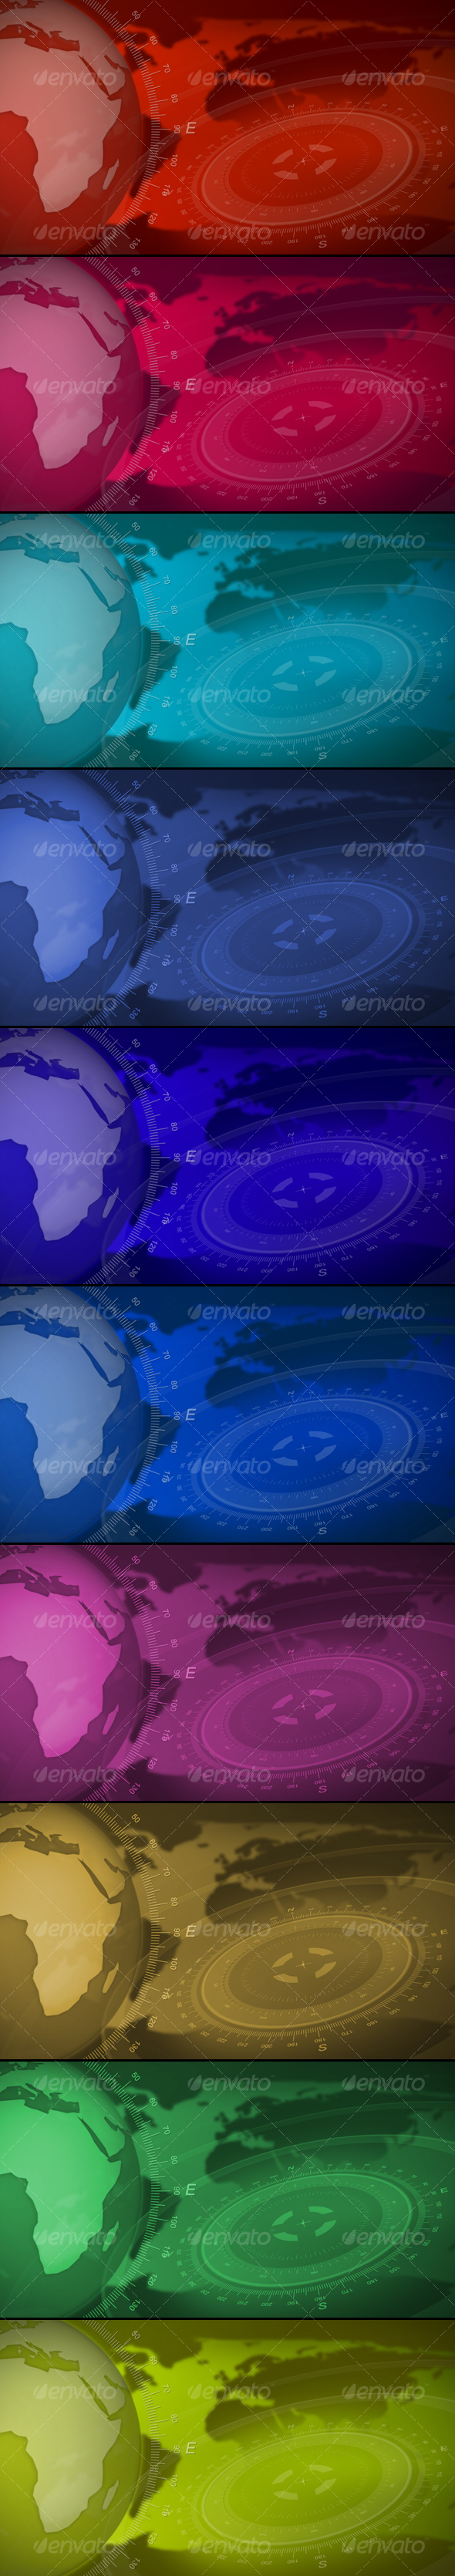 GraphicRiver Broadcast Design Backgrounds 83997